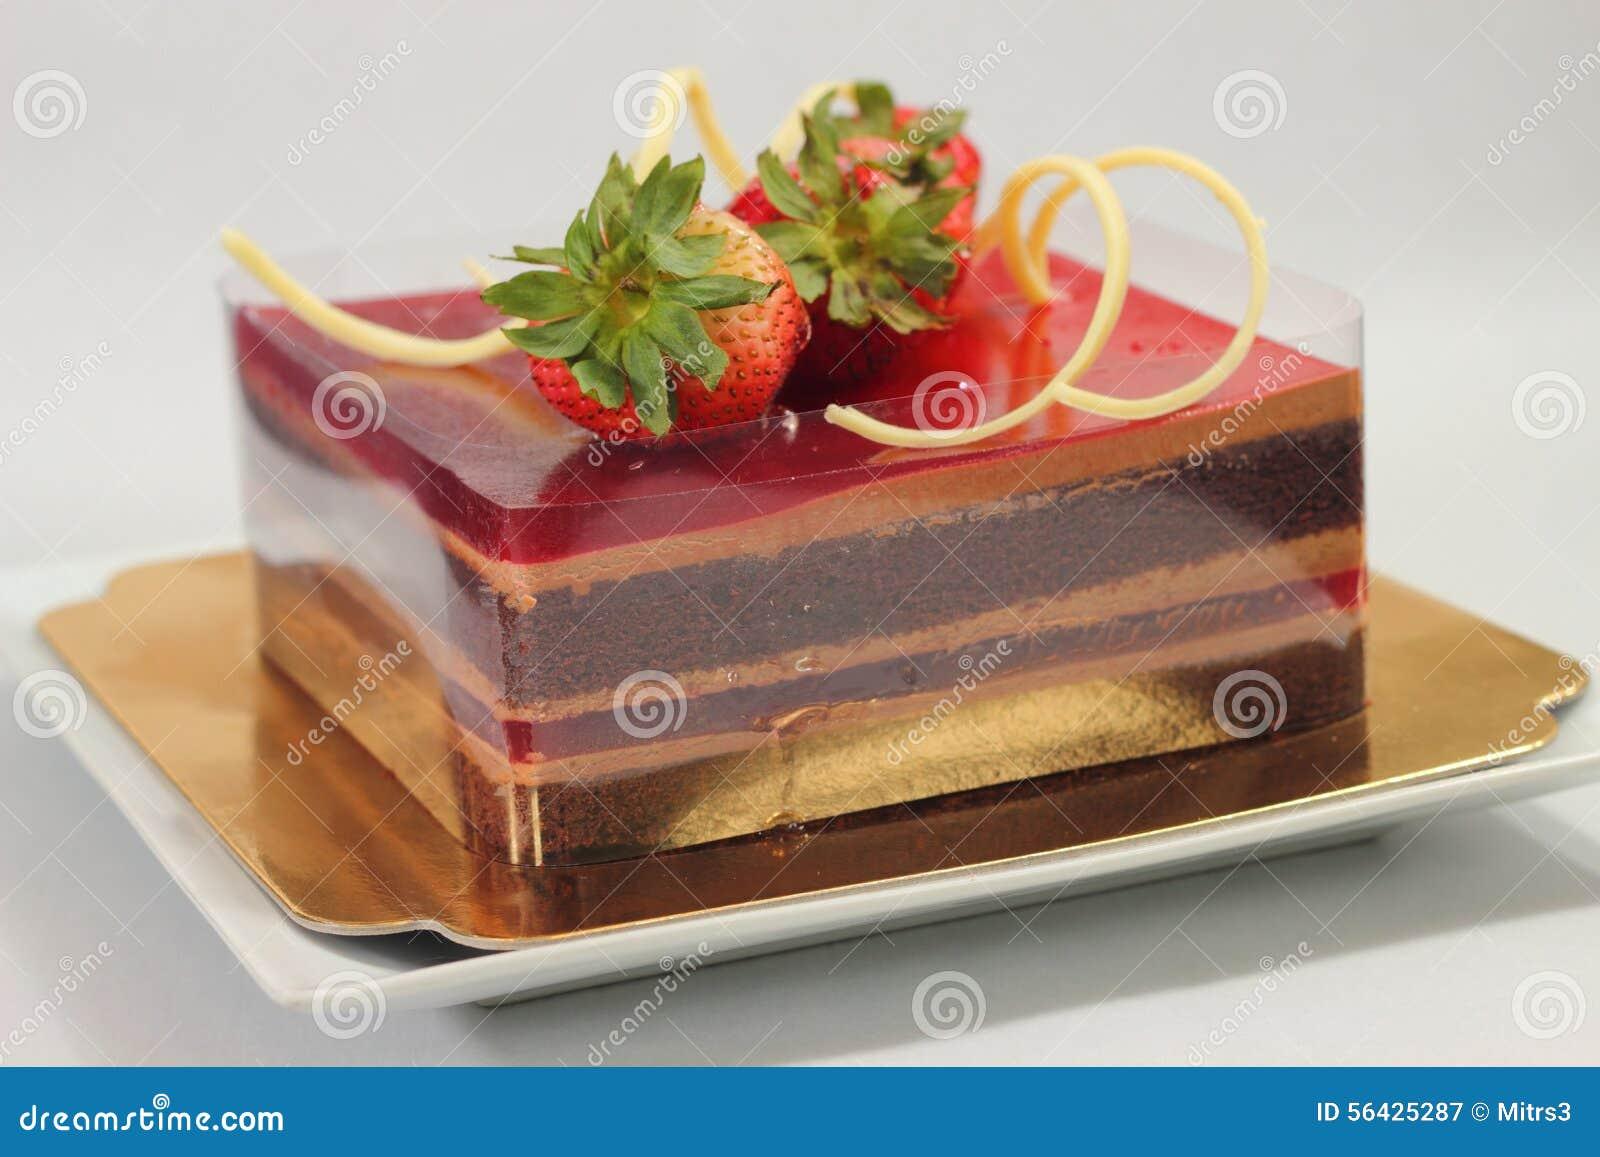 Delicious Chocolate Strawberry Cake Stock Photo - Image: 56425287